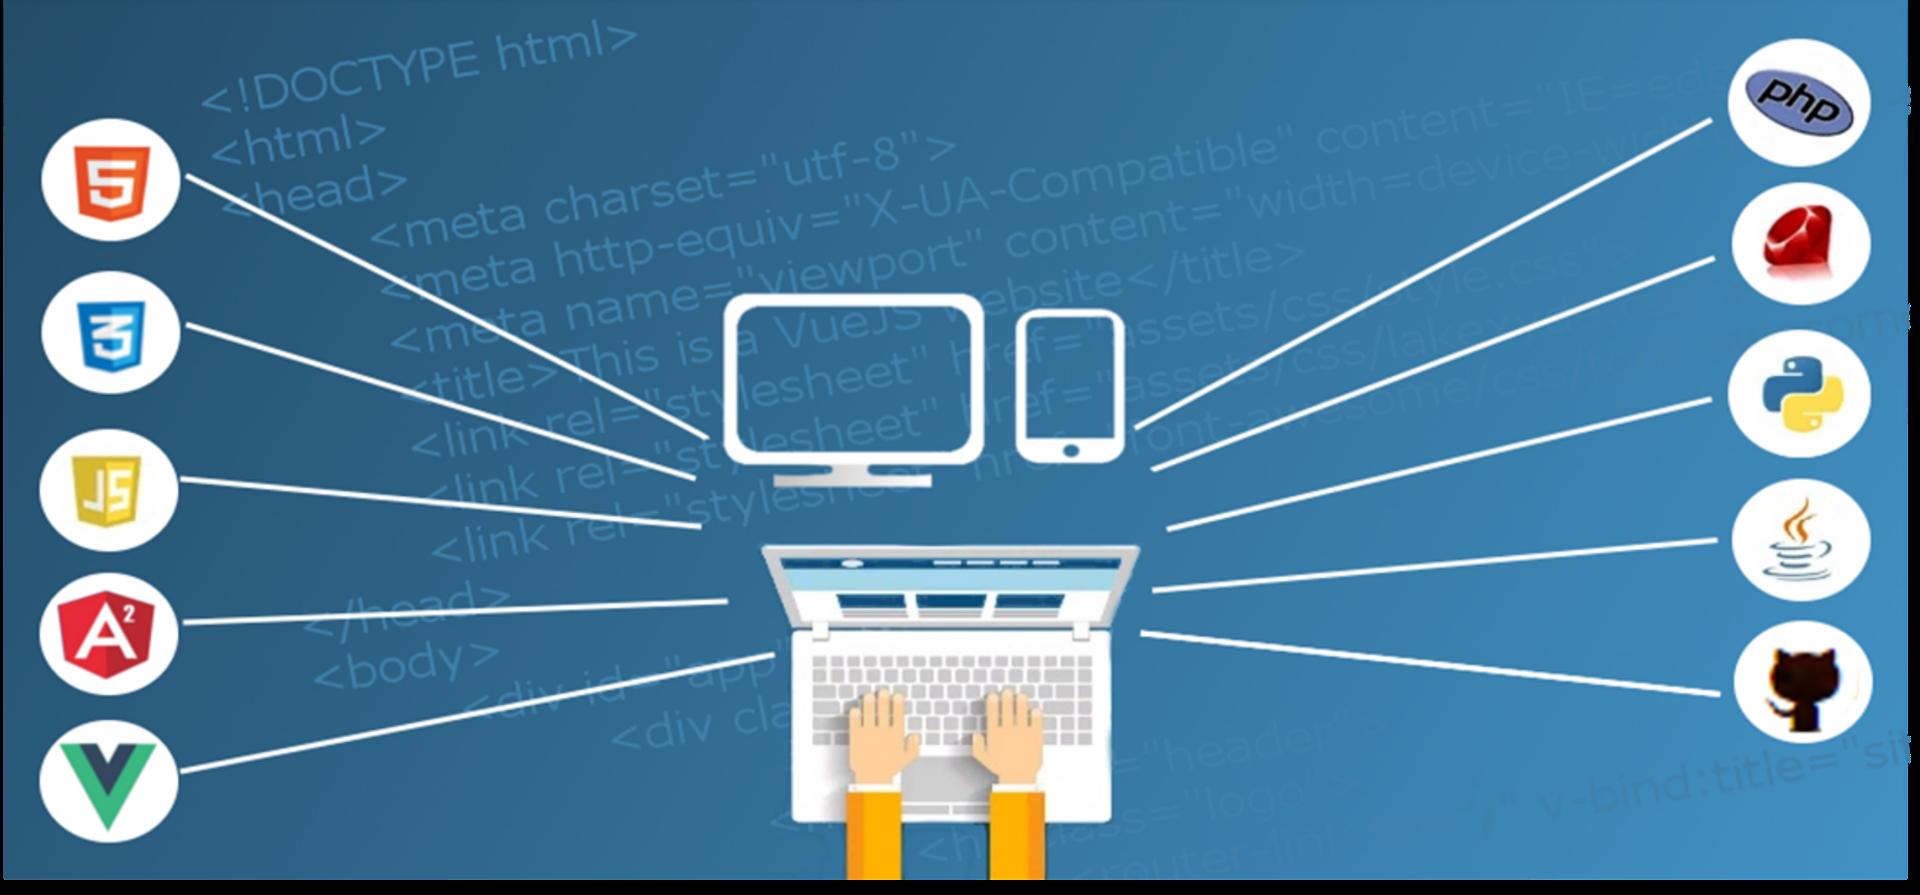 popular-web-development-frameworks-2019